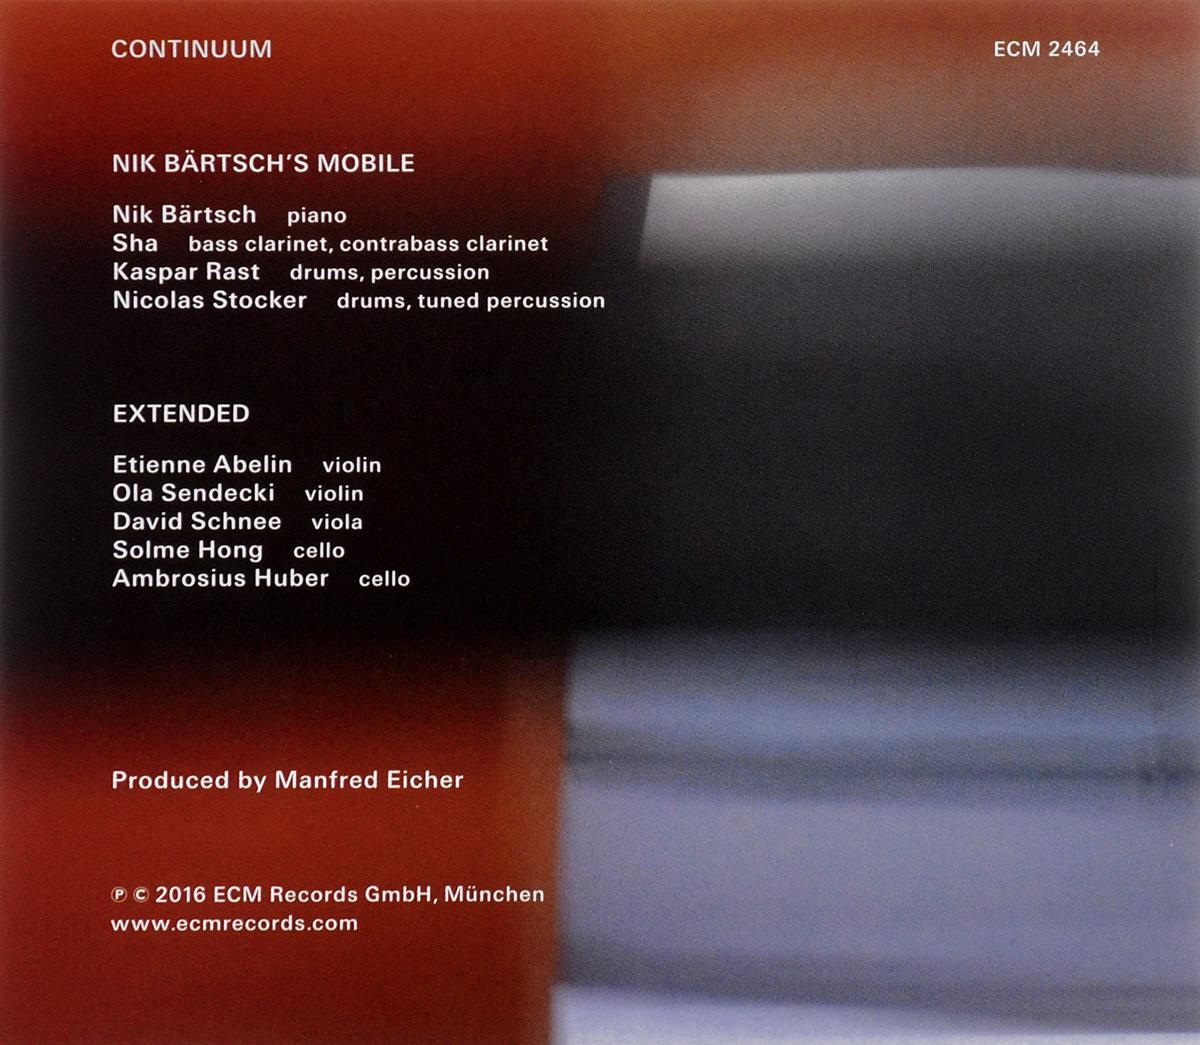 Nik Bartsch's Mobile.  Continuum